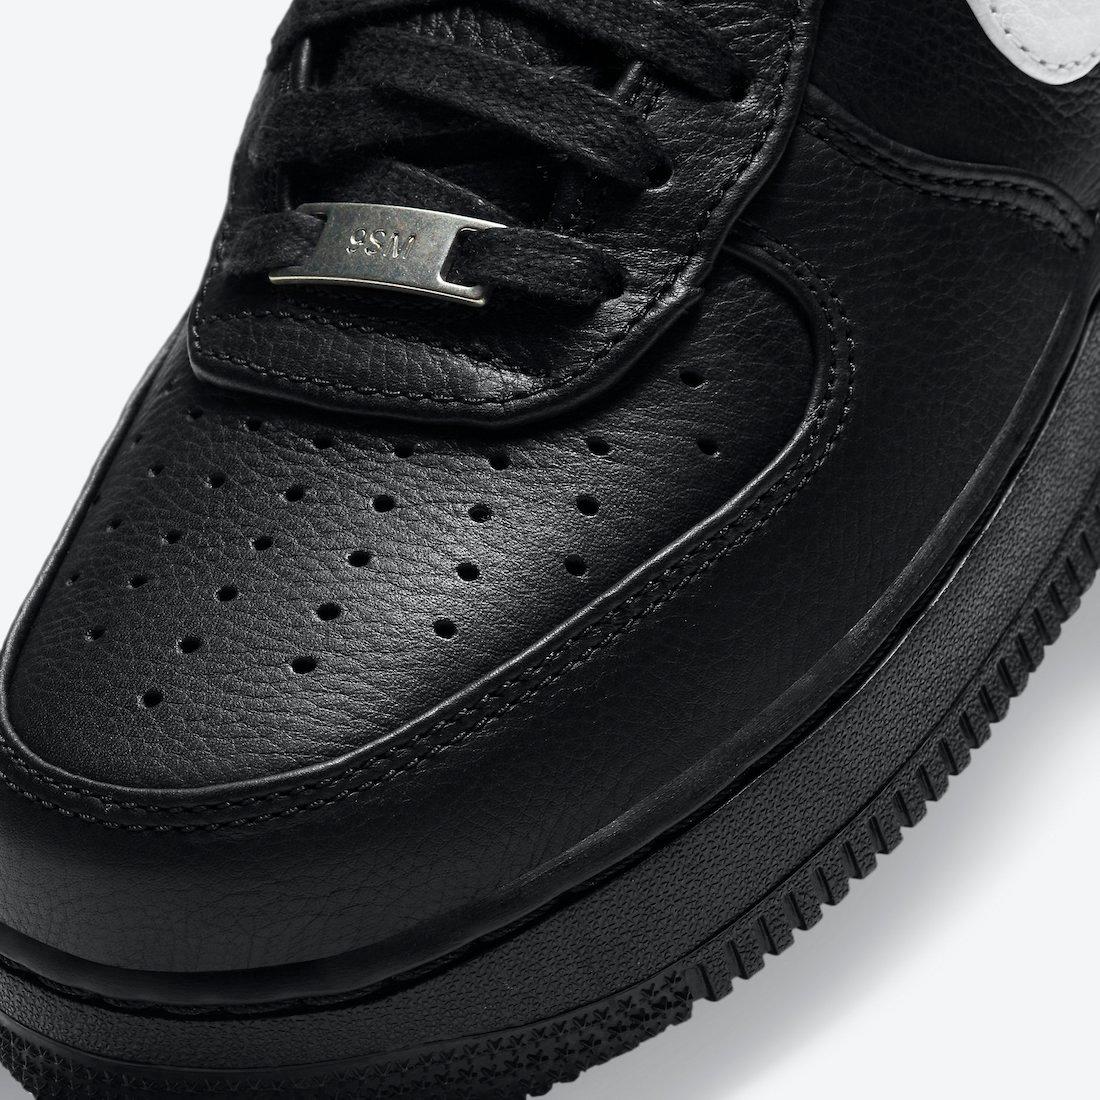 Alyx Nike Air Force 1 High Black White CQ4018-002 Release Date